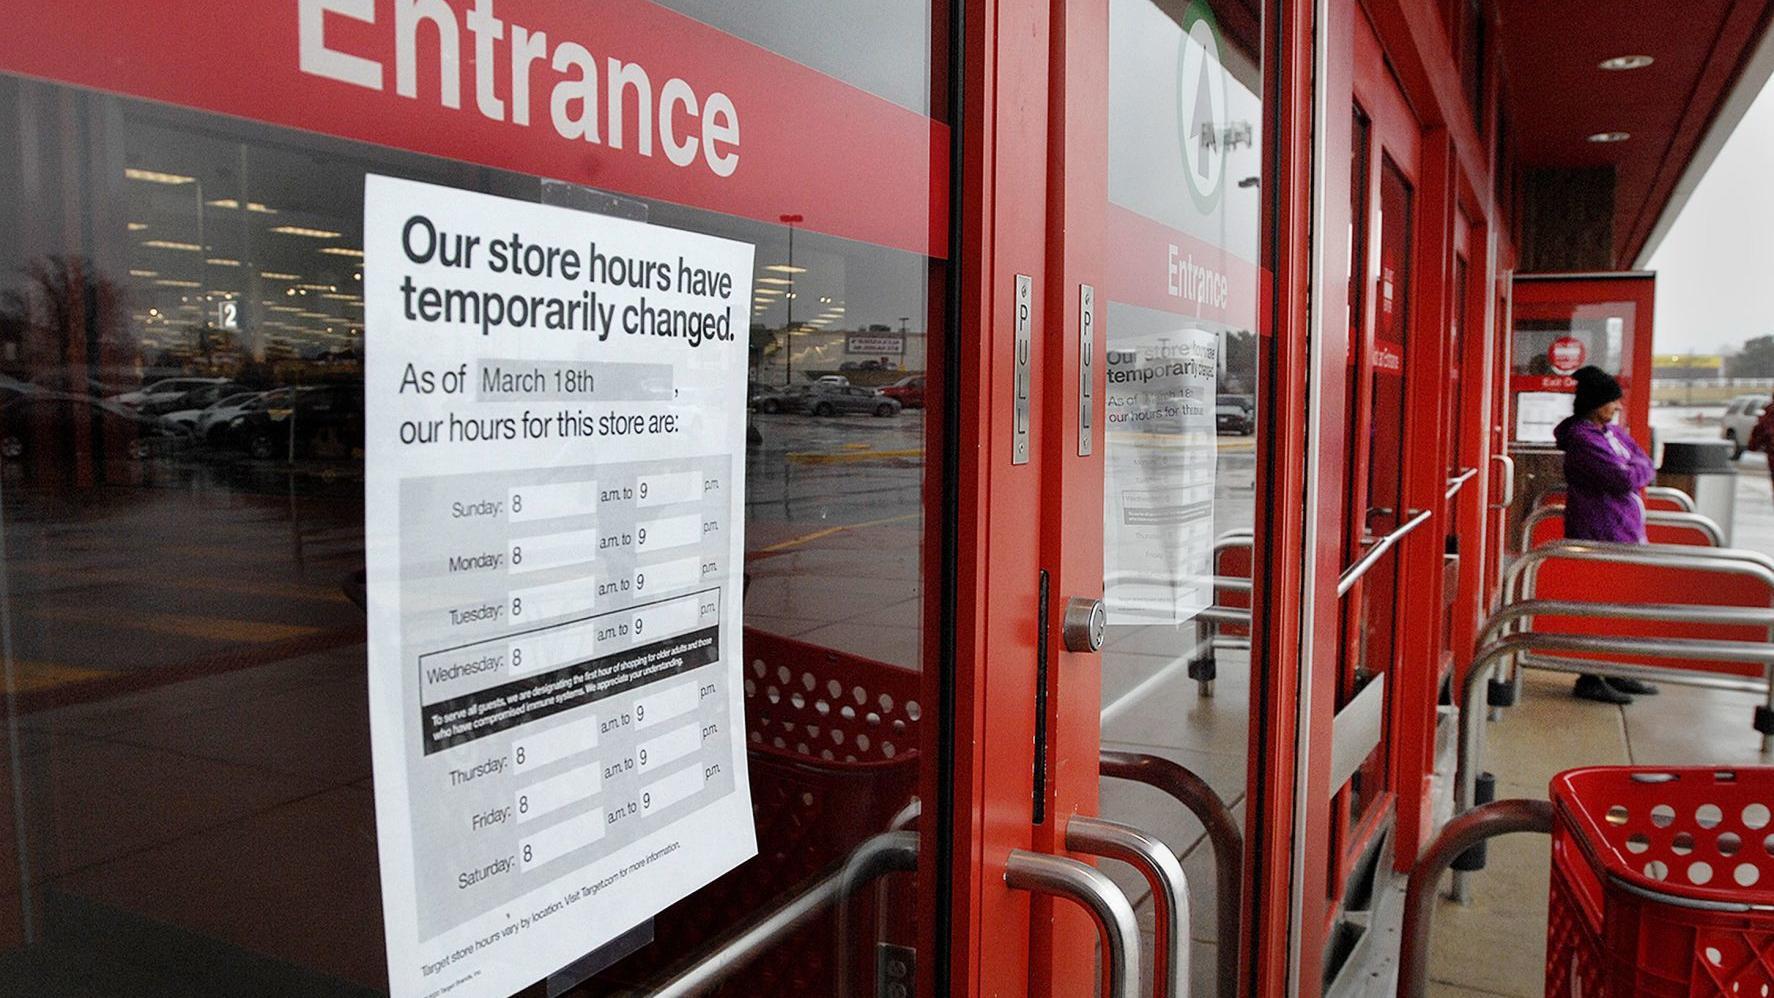 Dollar General Target Schnucks Reserve Store Time For Seniors During Coronavirus Outbreak Business Pantagraph Com